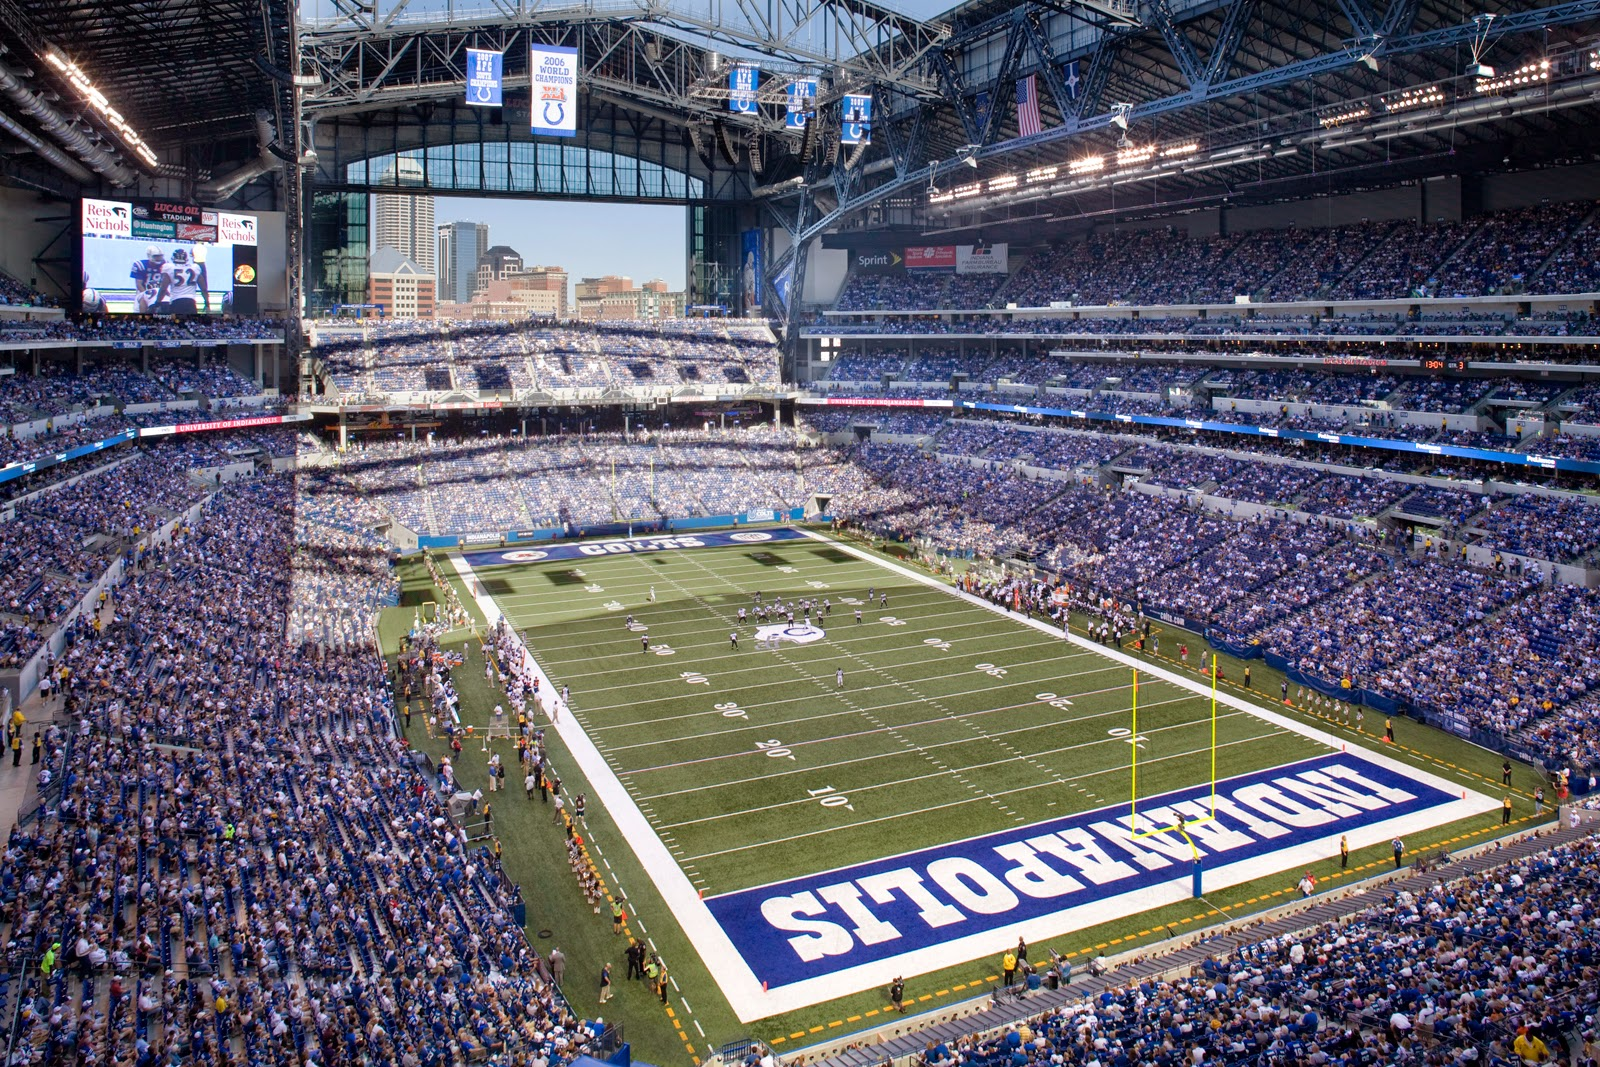 Indianapolis Colts Luxury Suites For Sale, Single Game Rentals, Lucas Oil Stadium